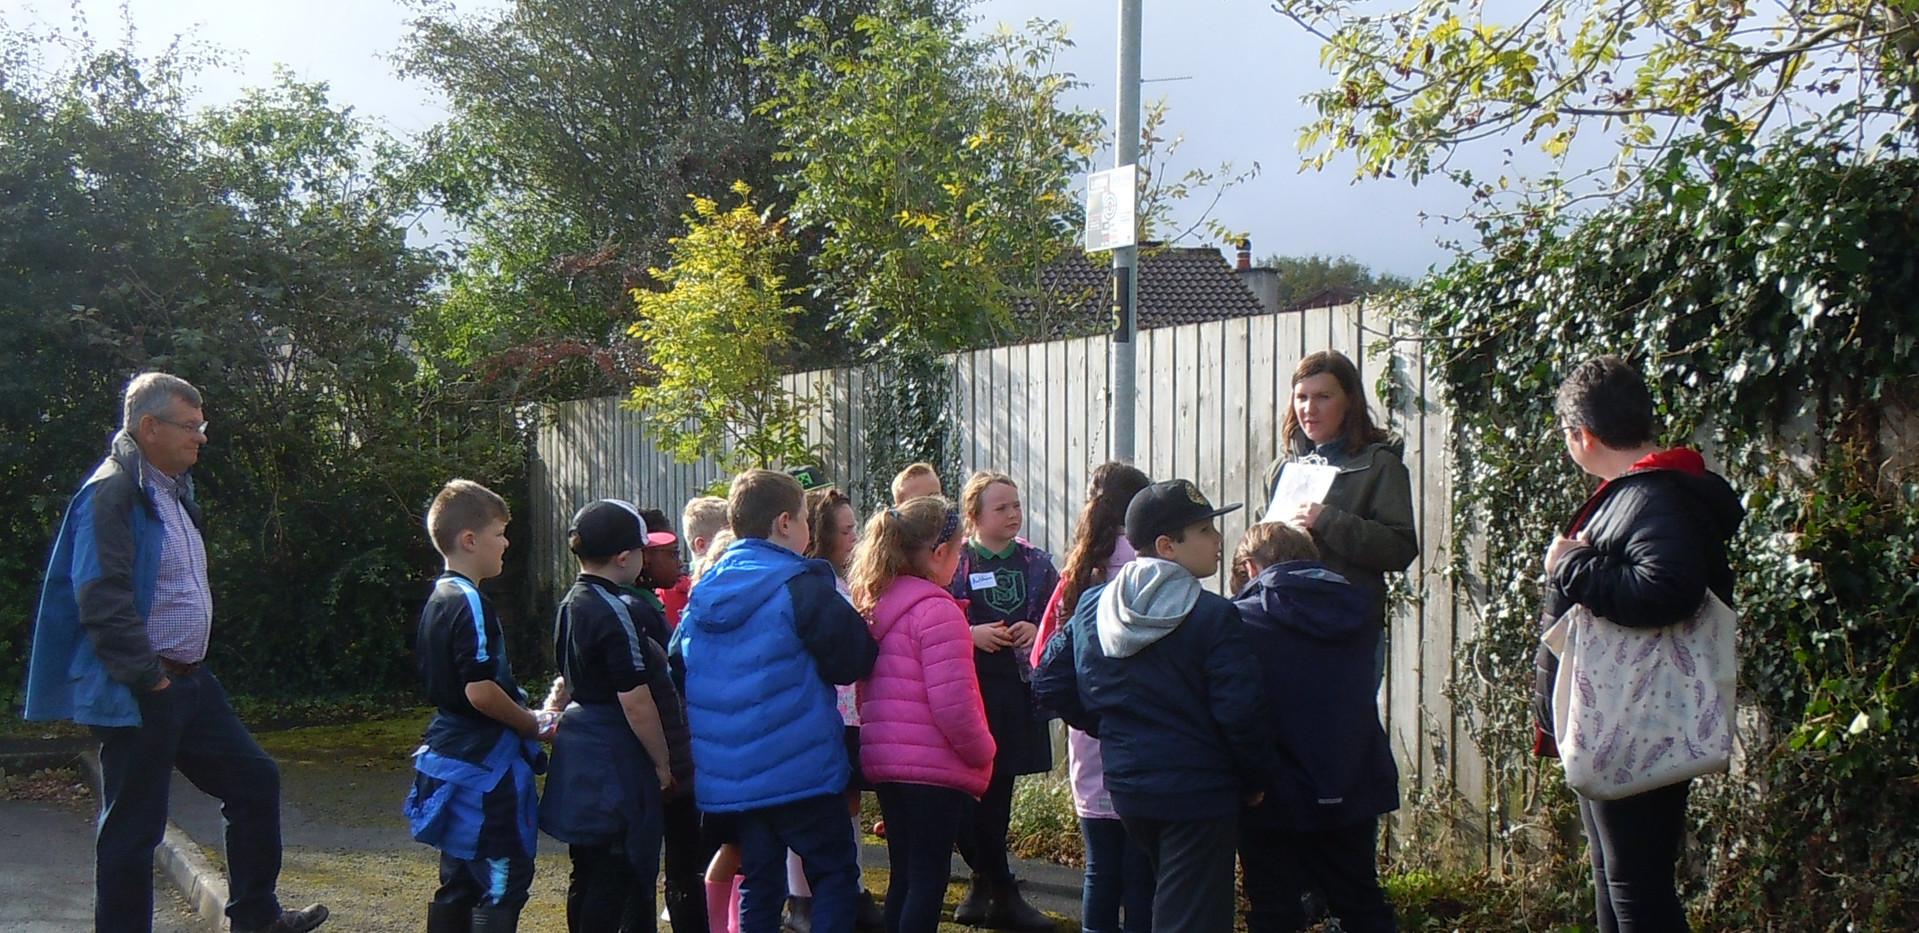 Mountsandel Schools Day 24Sep19 (1) - Co